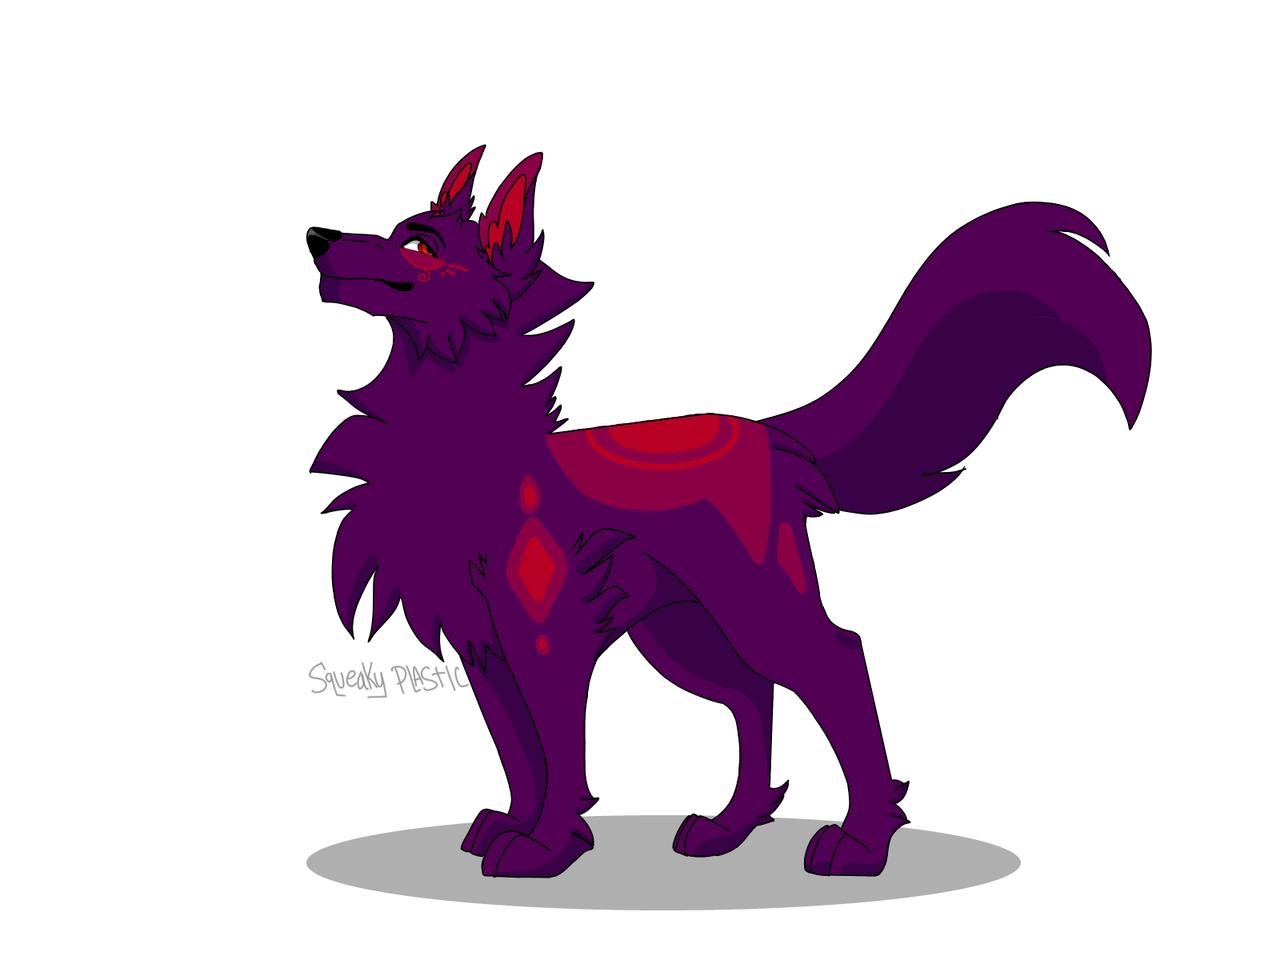 Line art practice #3 Illust of Squeaky Plastic medibangpaint oc wolf